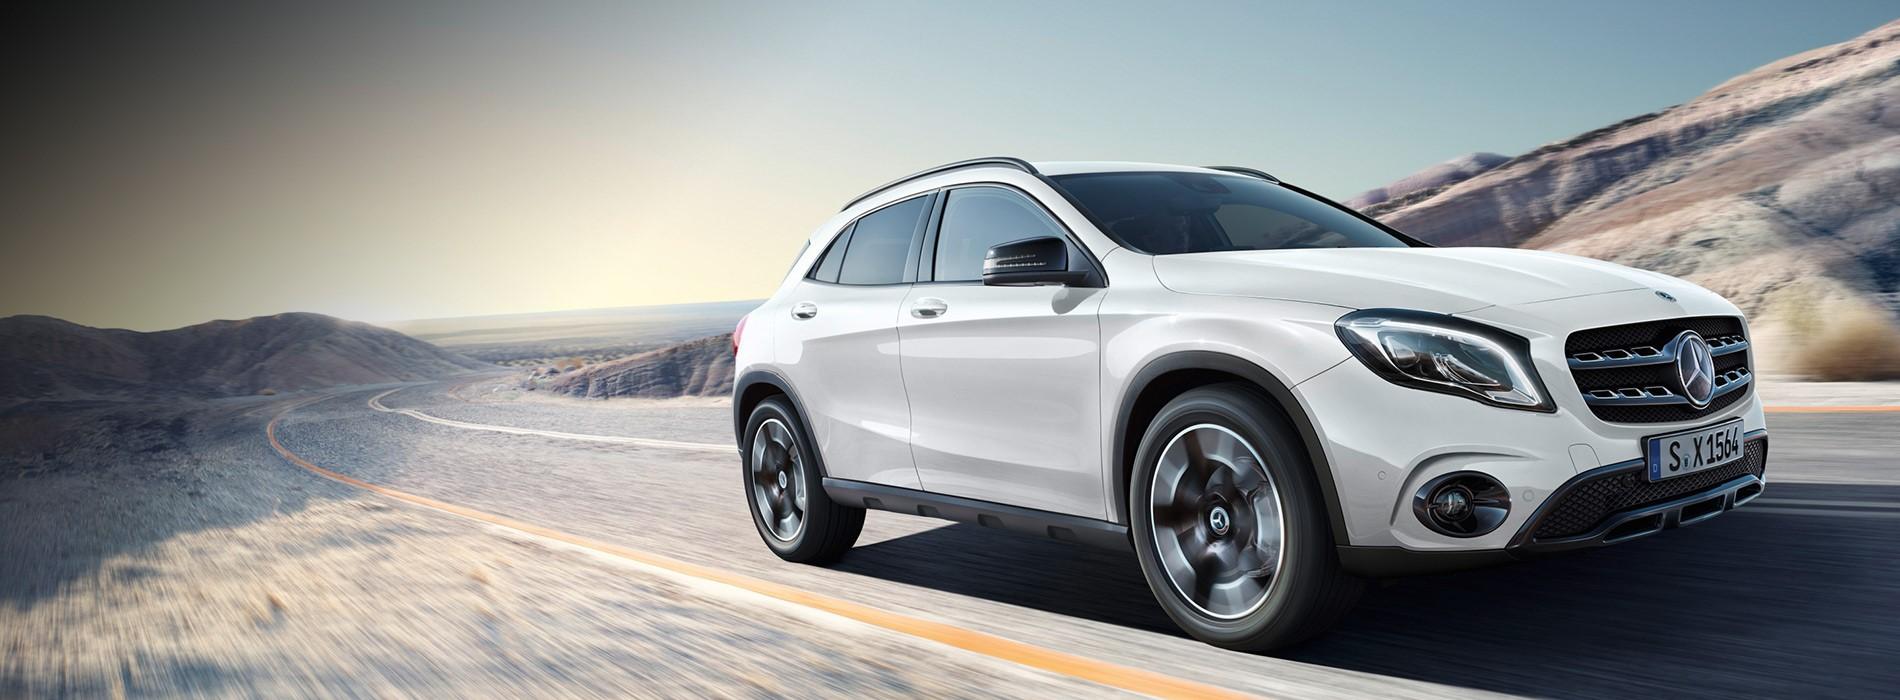 GLA SUV 2020